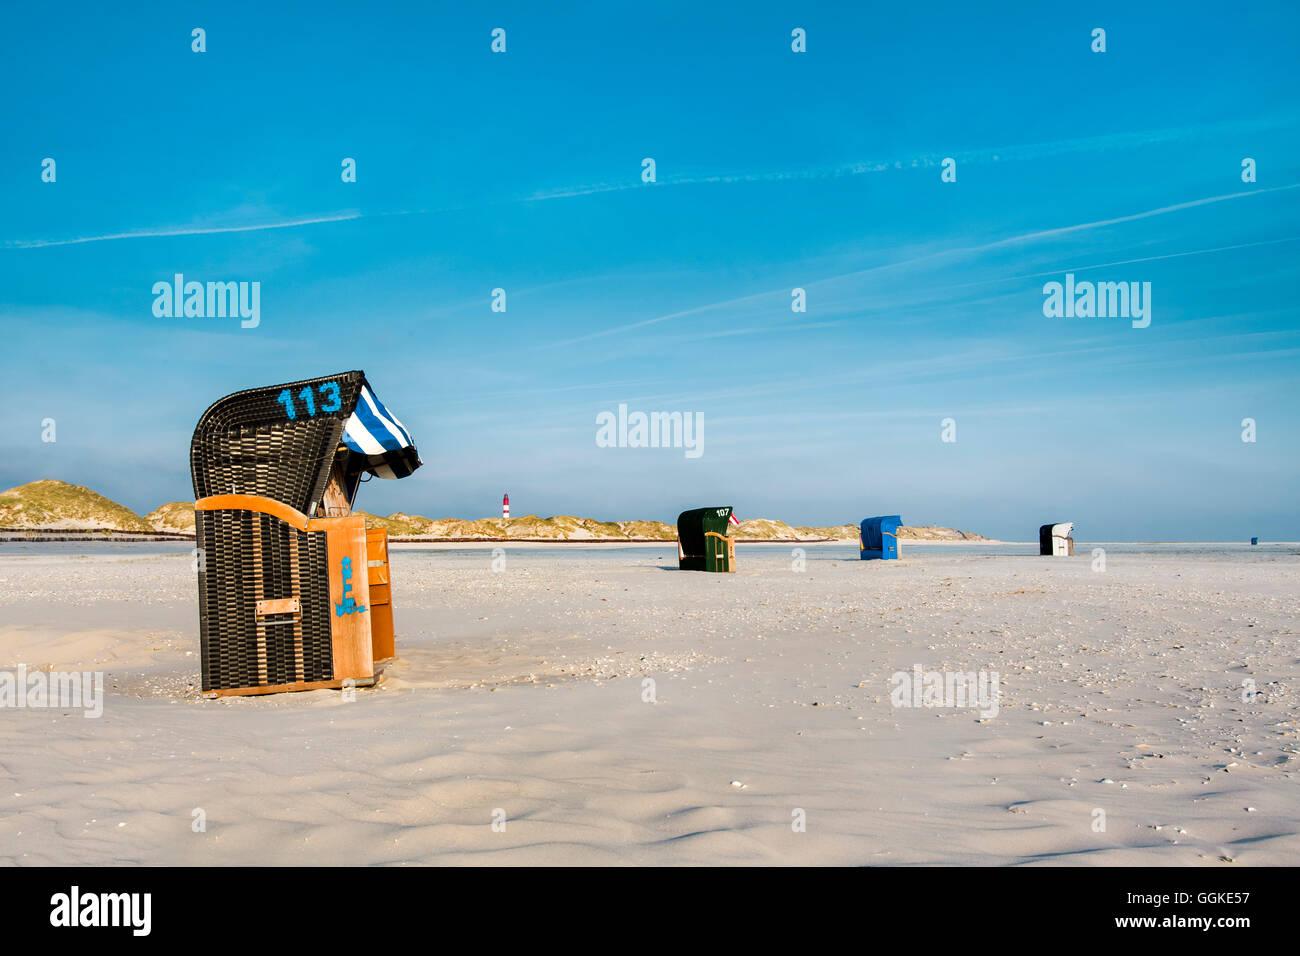 Beach chairs on the beaach, Amrum Island, North Frisian Islands, Schleswig-Holstein, Germany - Stock Image